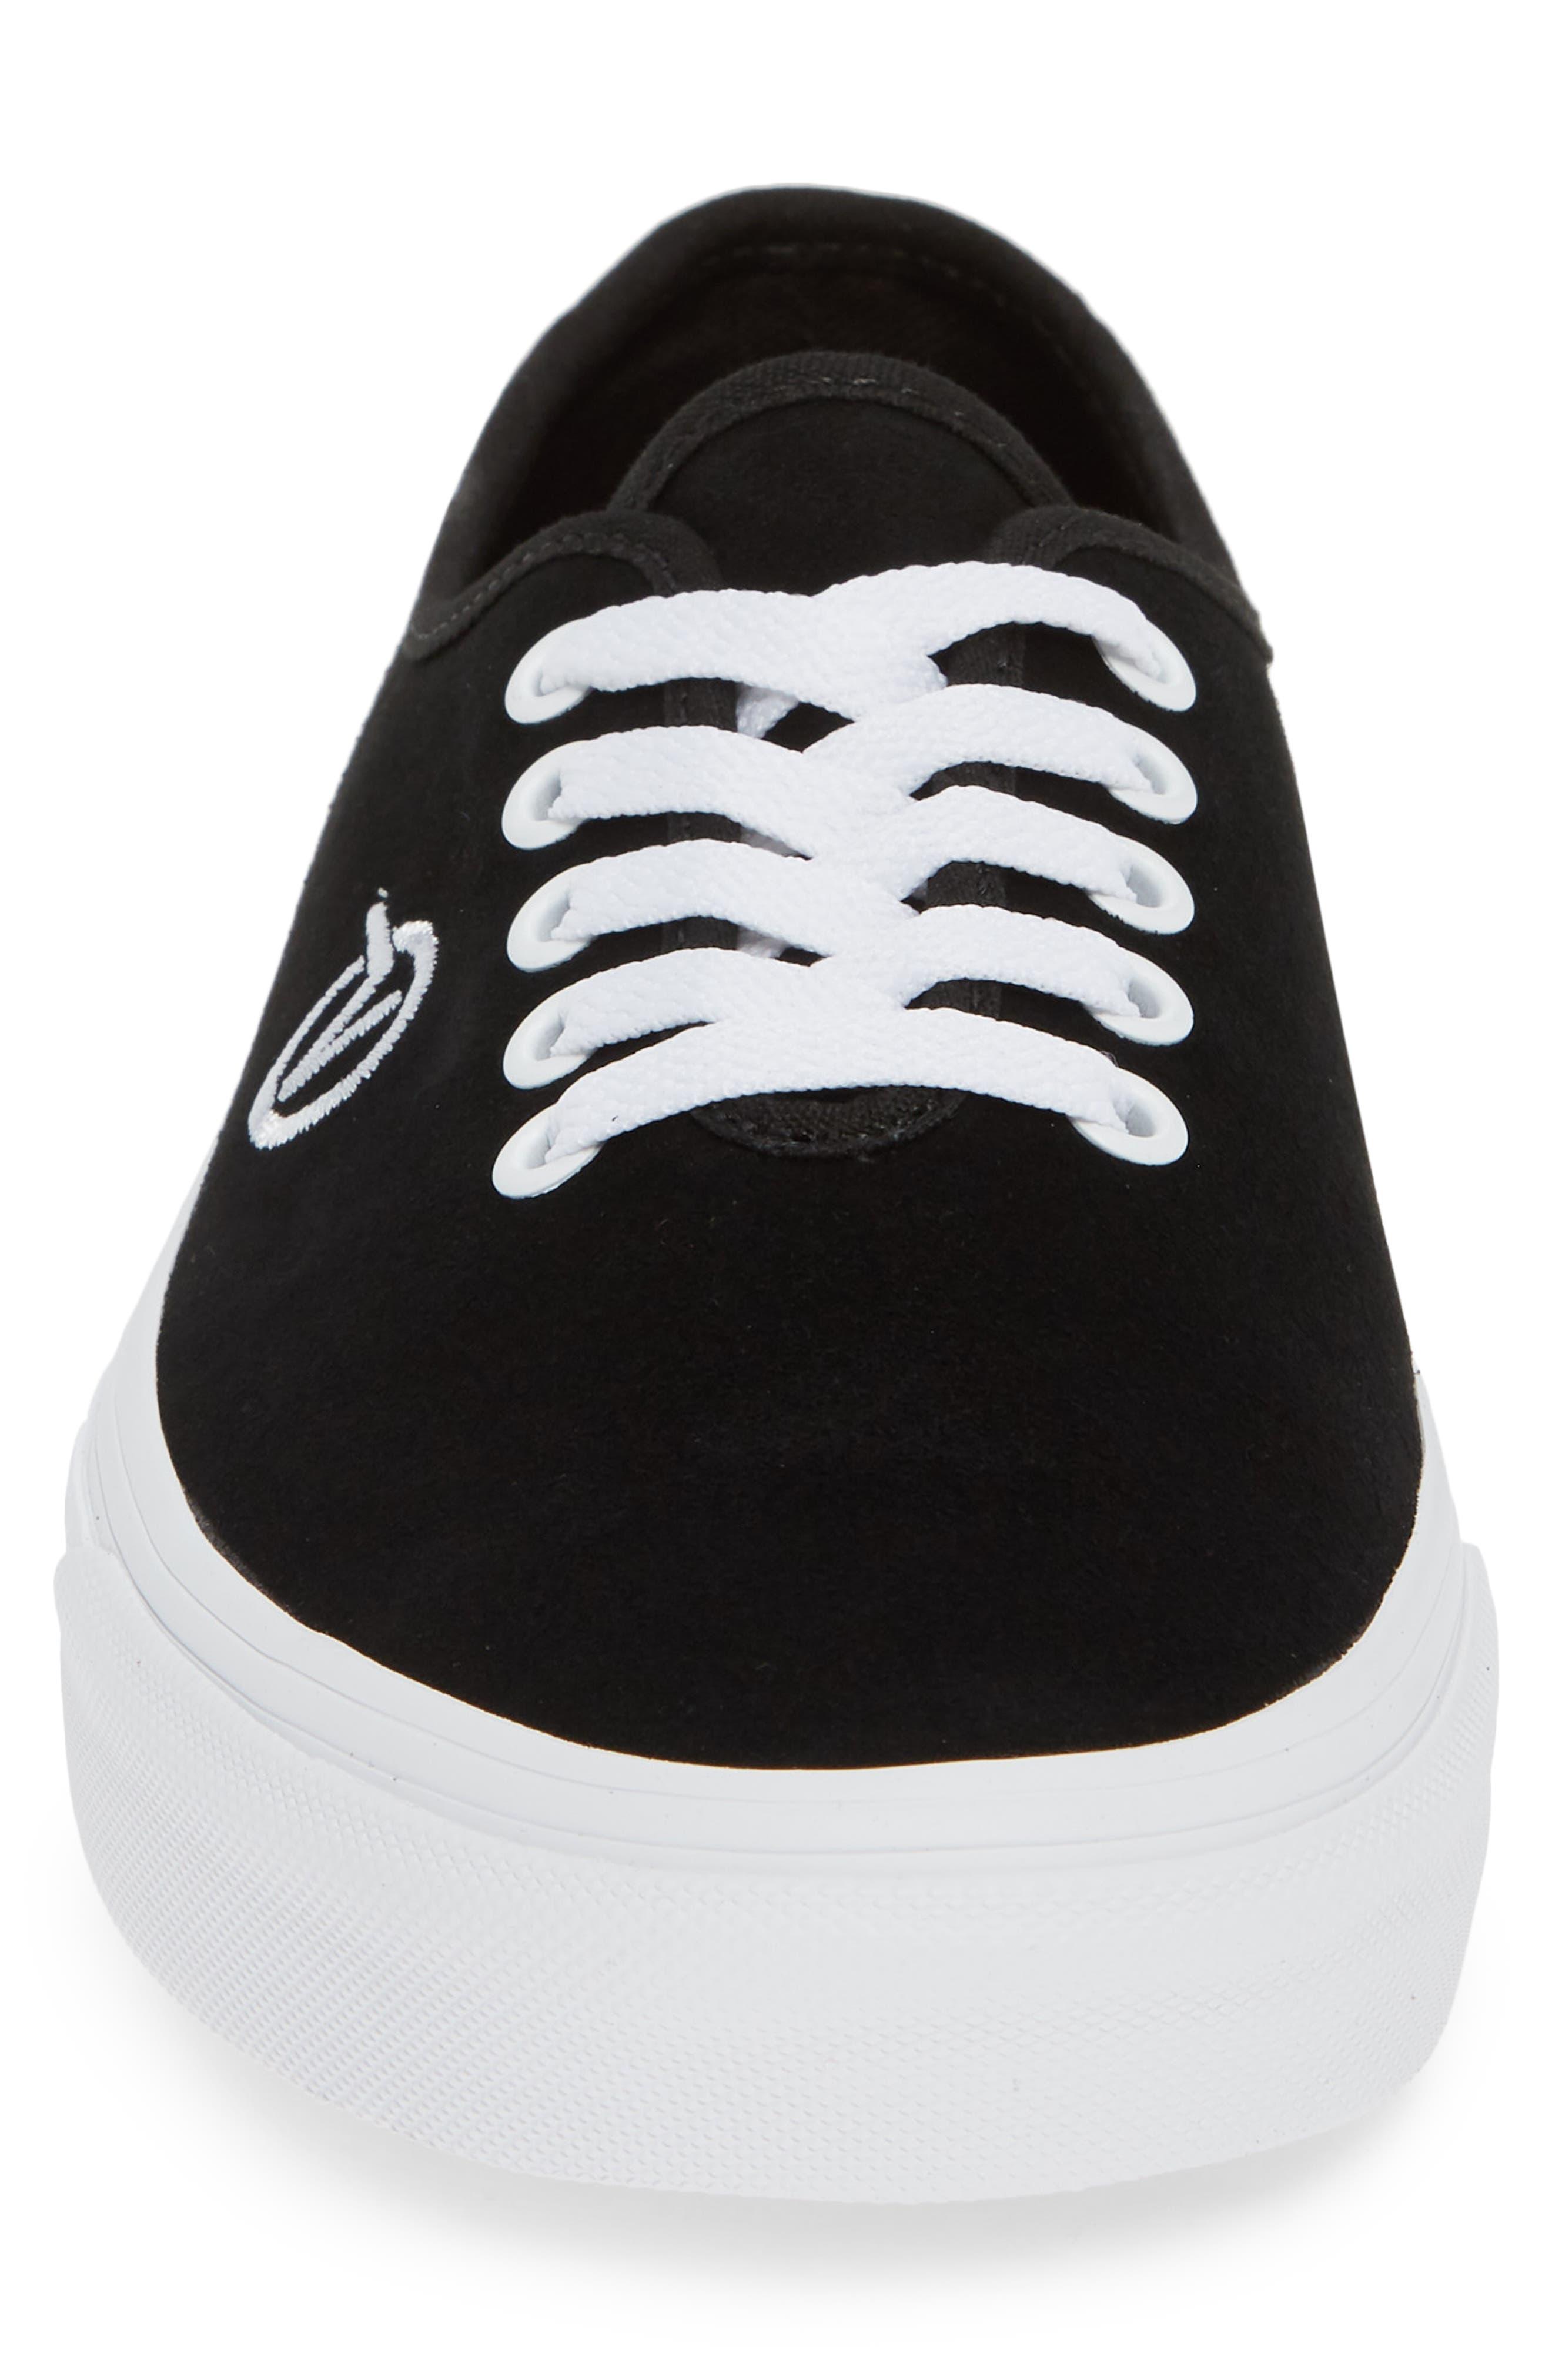 Authentic One-Piece Sneaker,                             Alternate thumbnail 4, color,                             BLACK/ SUEDE